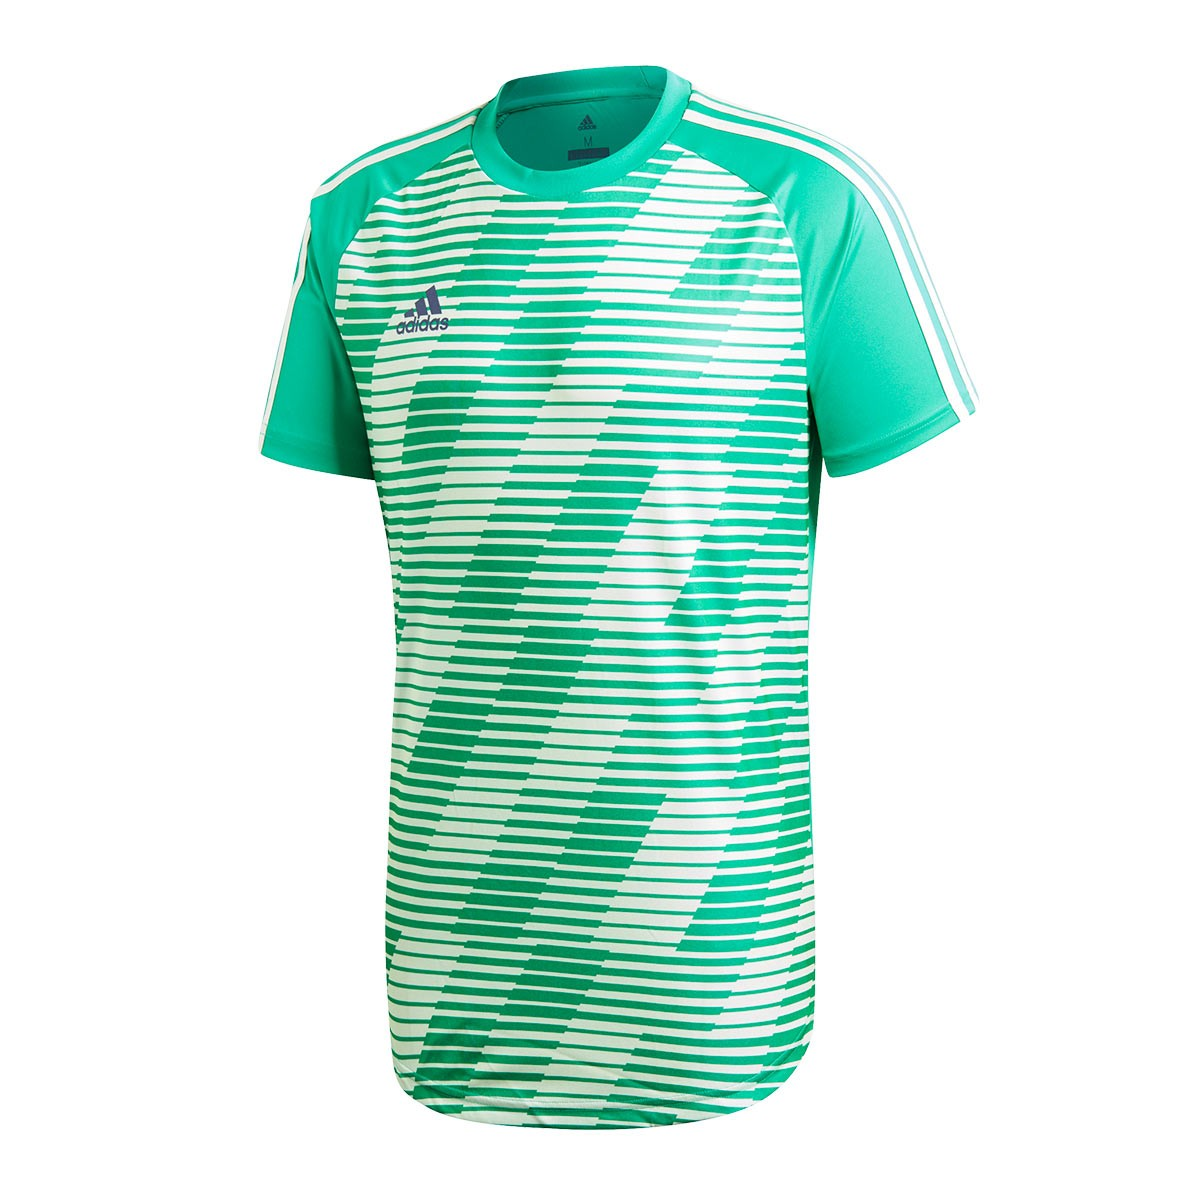 b7f1d8bf394 Camisola adidas Tango Graphic Core green - Loja de futebol Fútbol Emotion